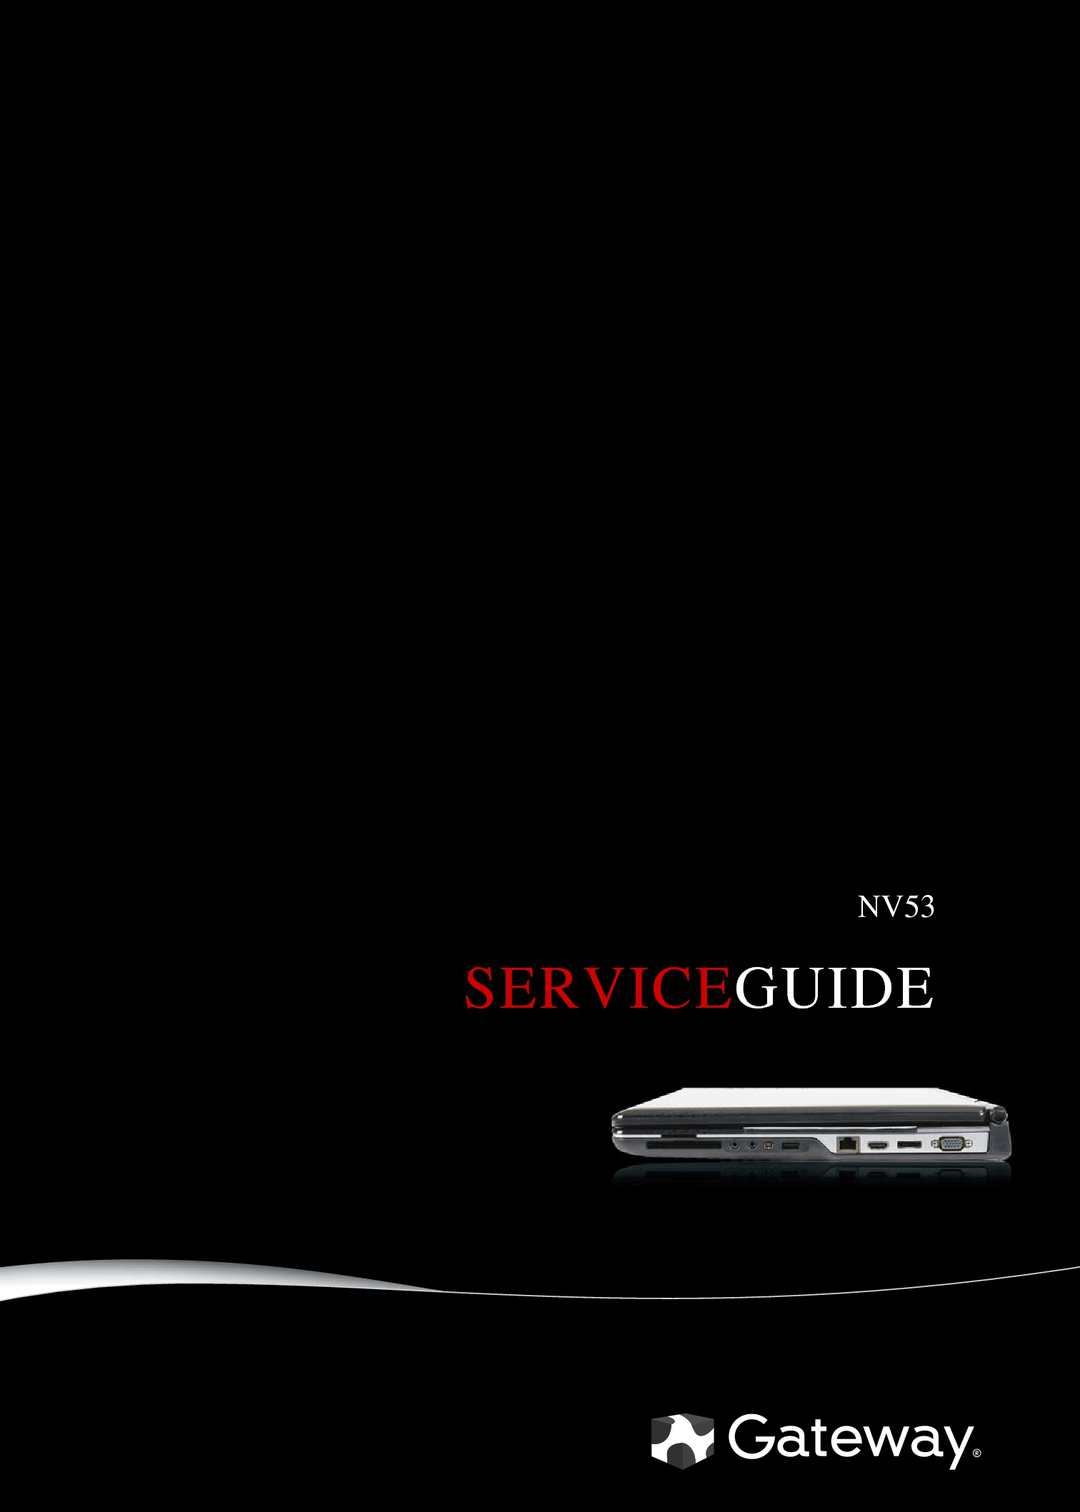 Calamo Gateway Nv53 Service Manual Usb Serial Port Cable Connection Diagram Usrobotics 56k Dialup